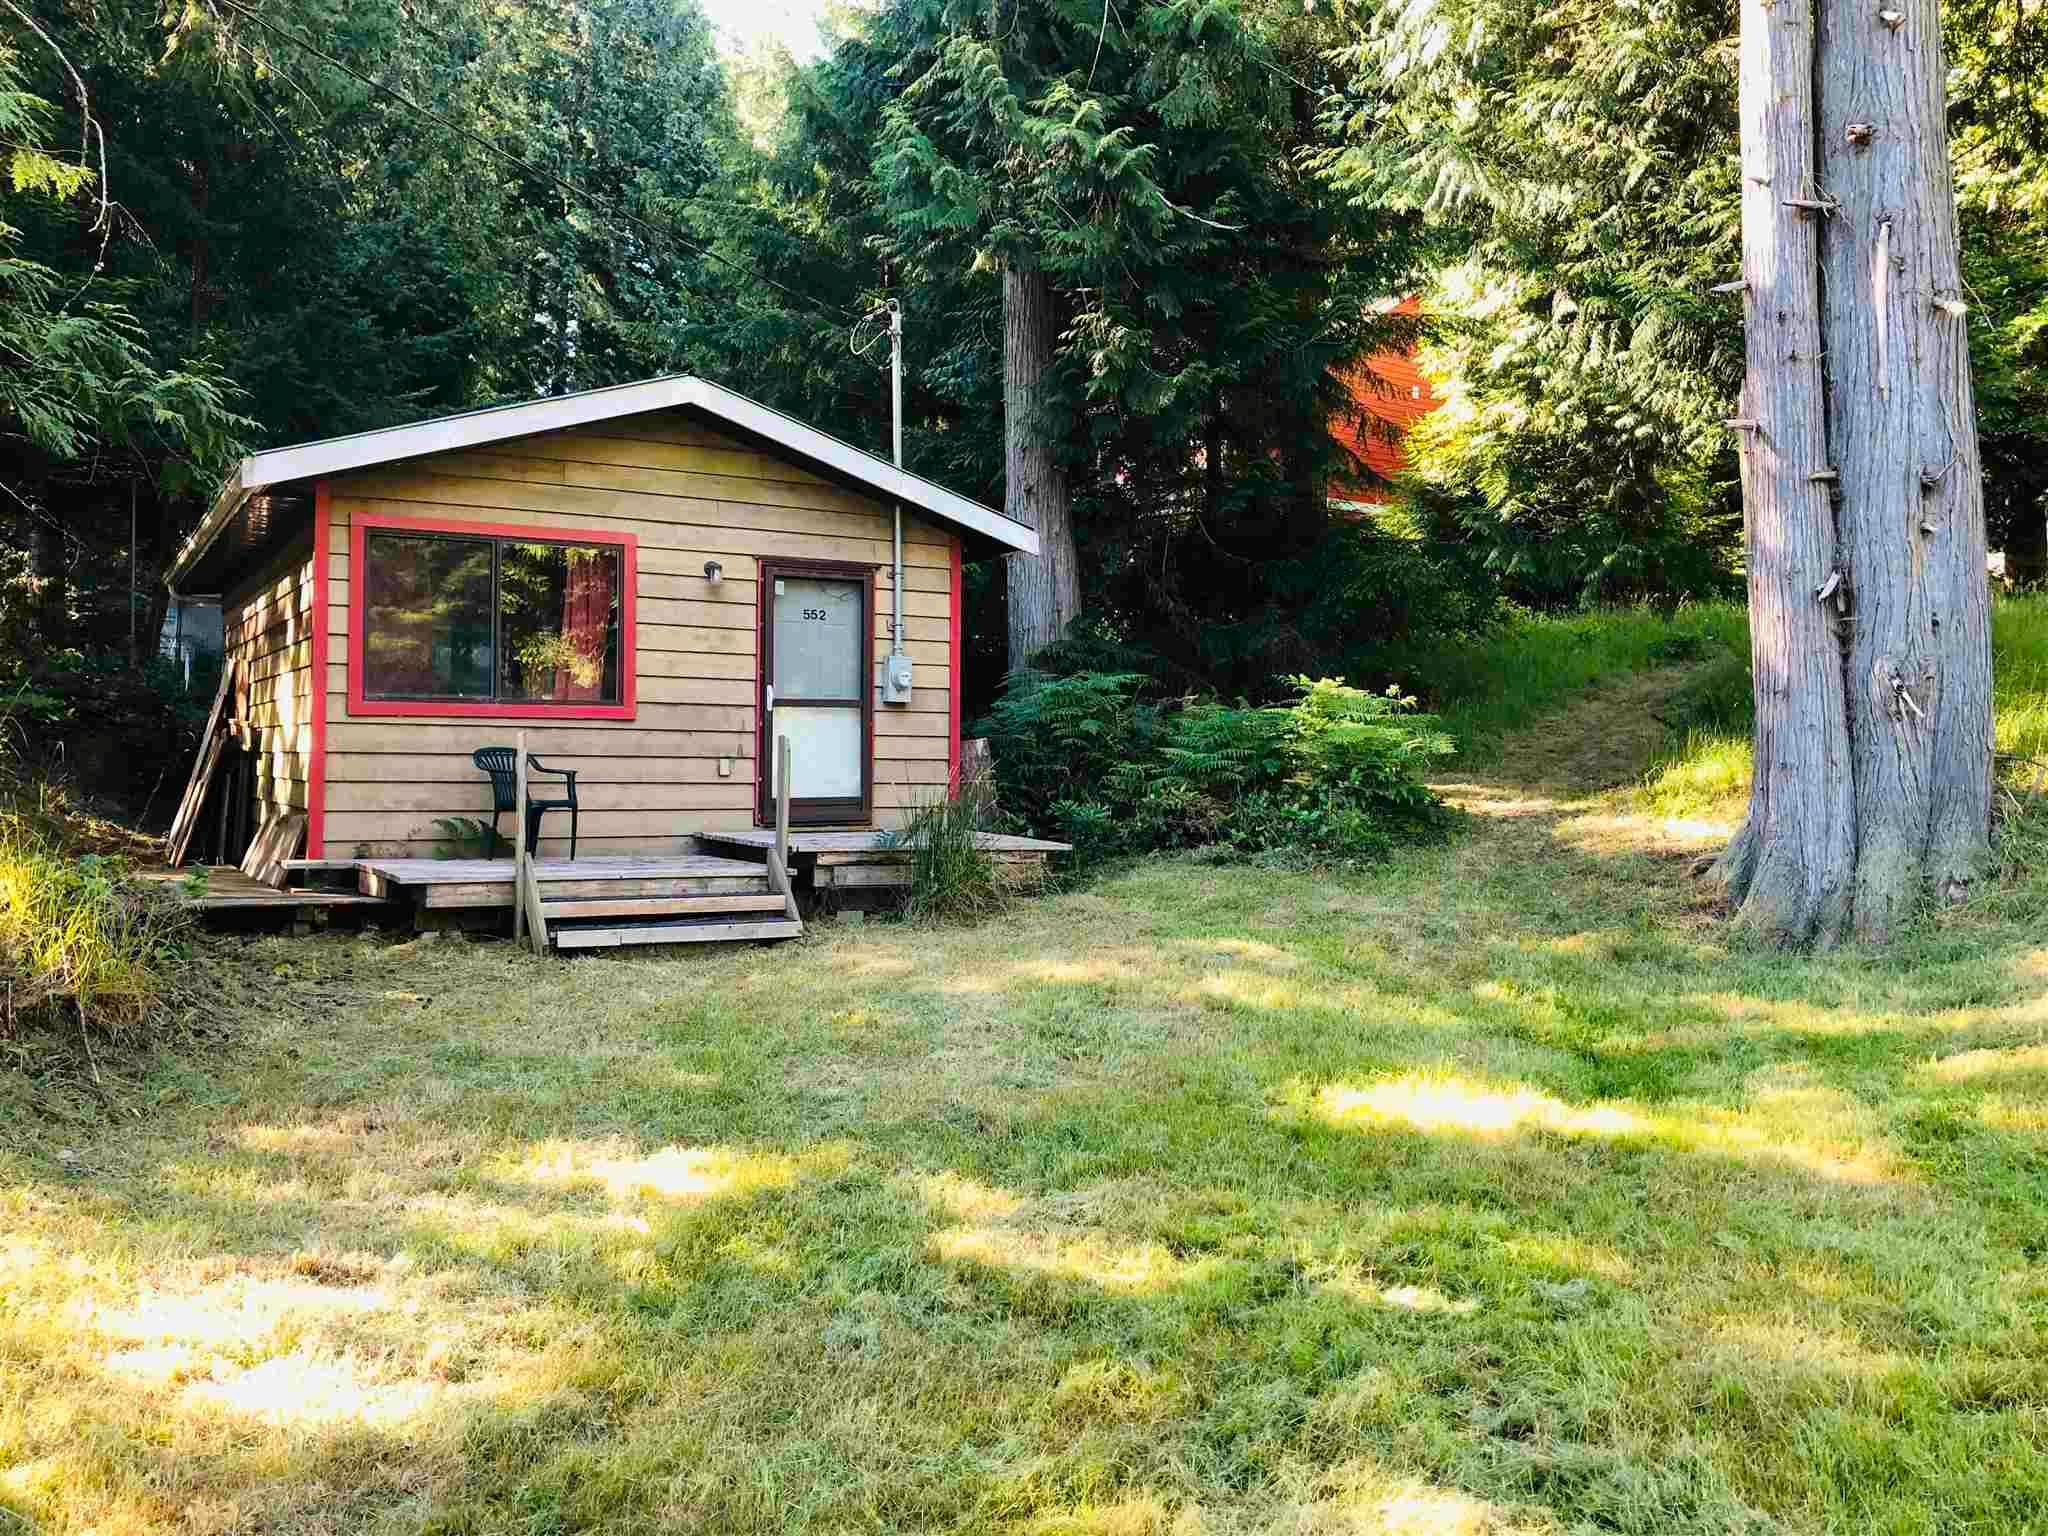 Main Photo: 552 AYA REACH Road: Mayne Island House for sale (Islands-Van. & Gulf)  : MLS®# R2595639